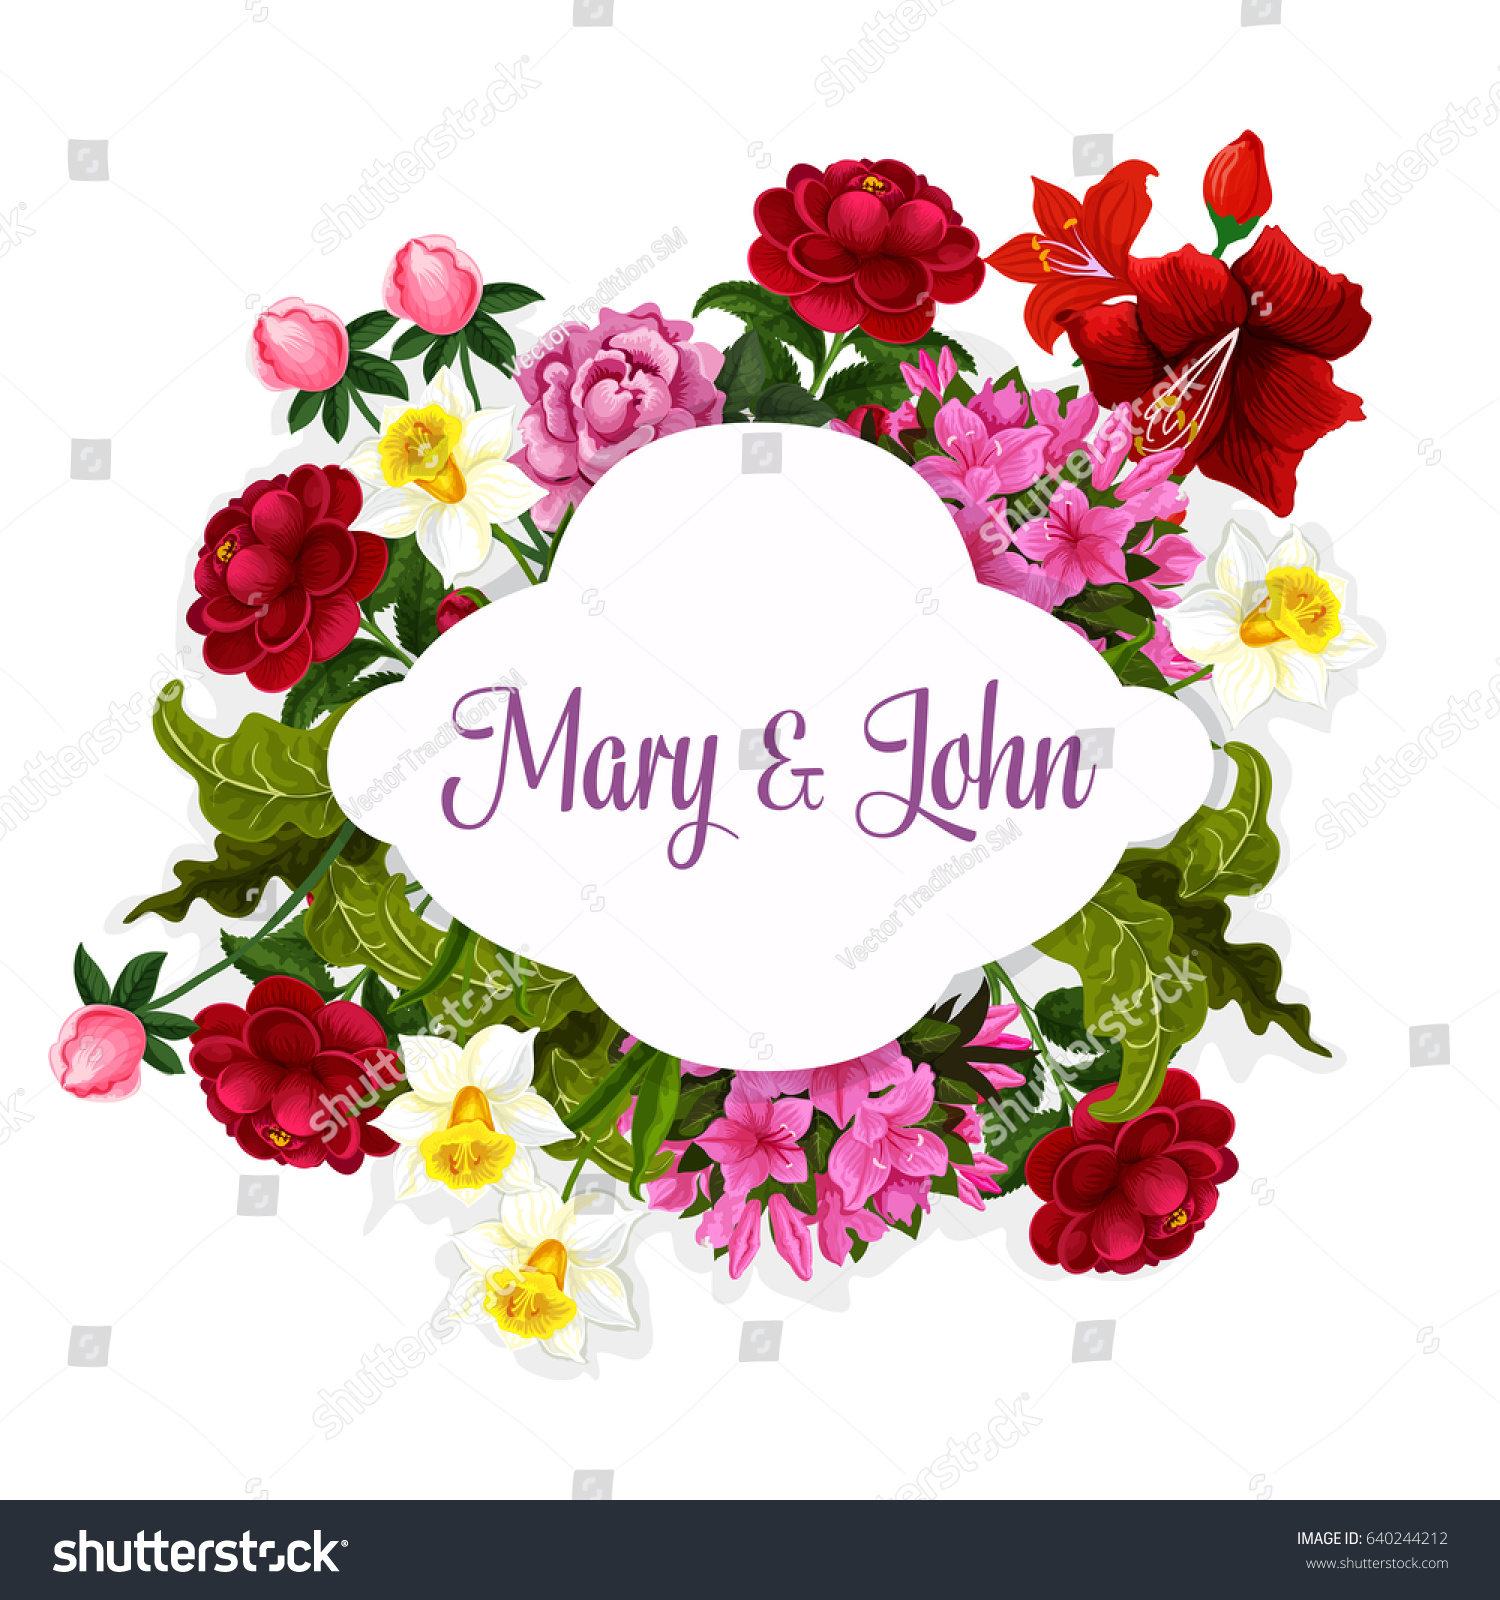 Wedding Flowers Bride Groom Names Template Stock Vector Royalty